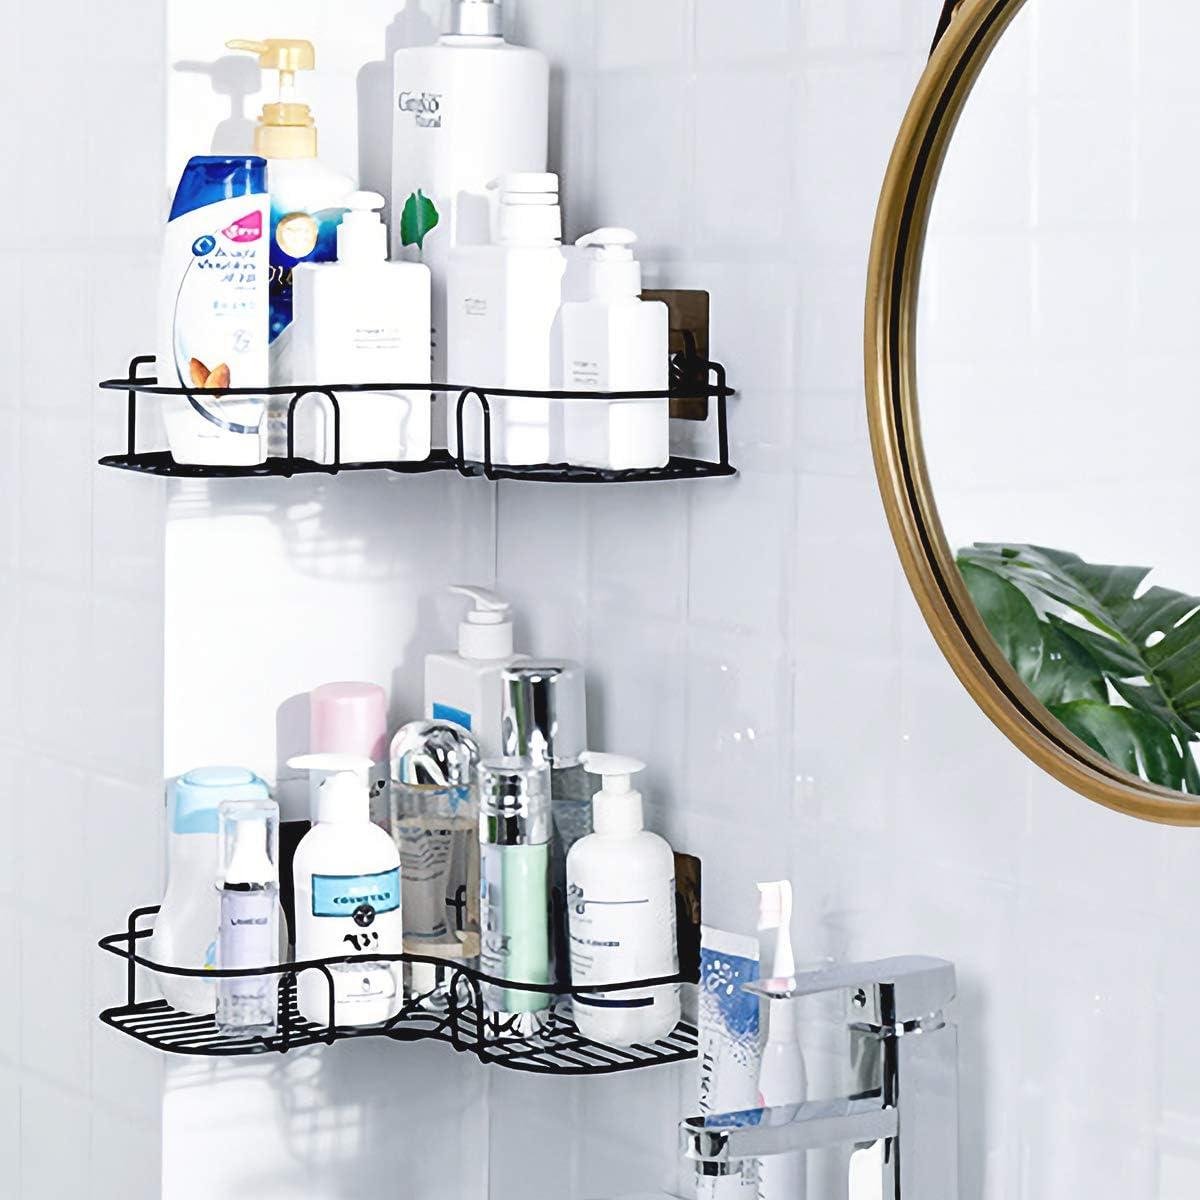 Laigoo Adhesive Bathroom Shelf, Metal Shower Caddy Corner Shelf Wall Mounted, Non-Drilling Floating Shelf for Bathroom Organizer/Kitchen/Shower Organizer (2 Pack, Black)